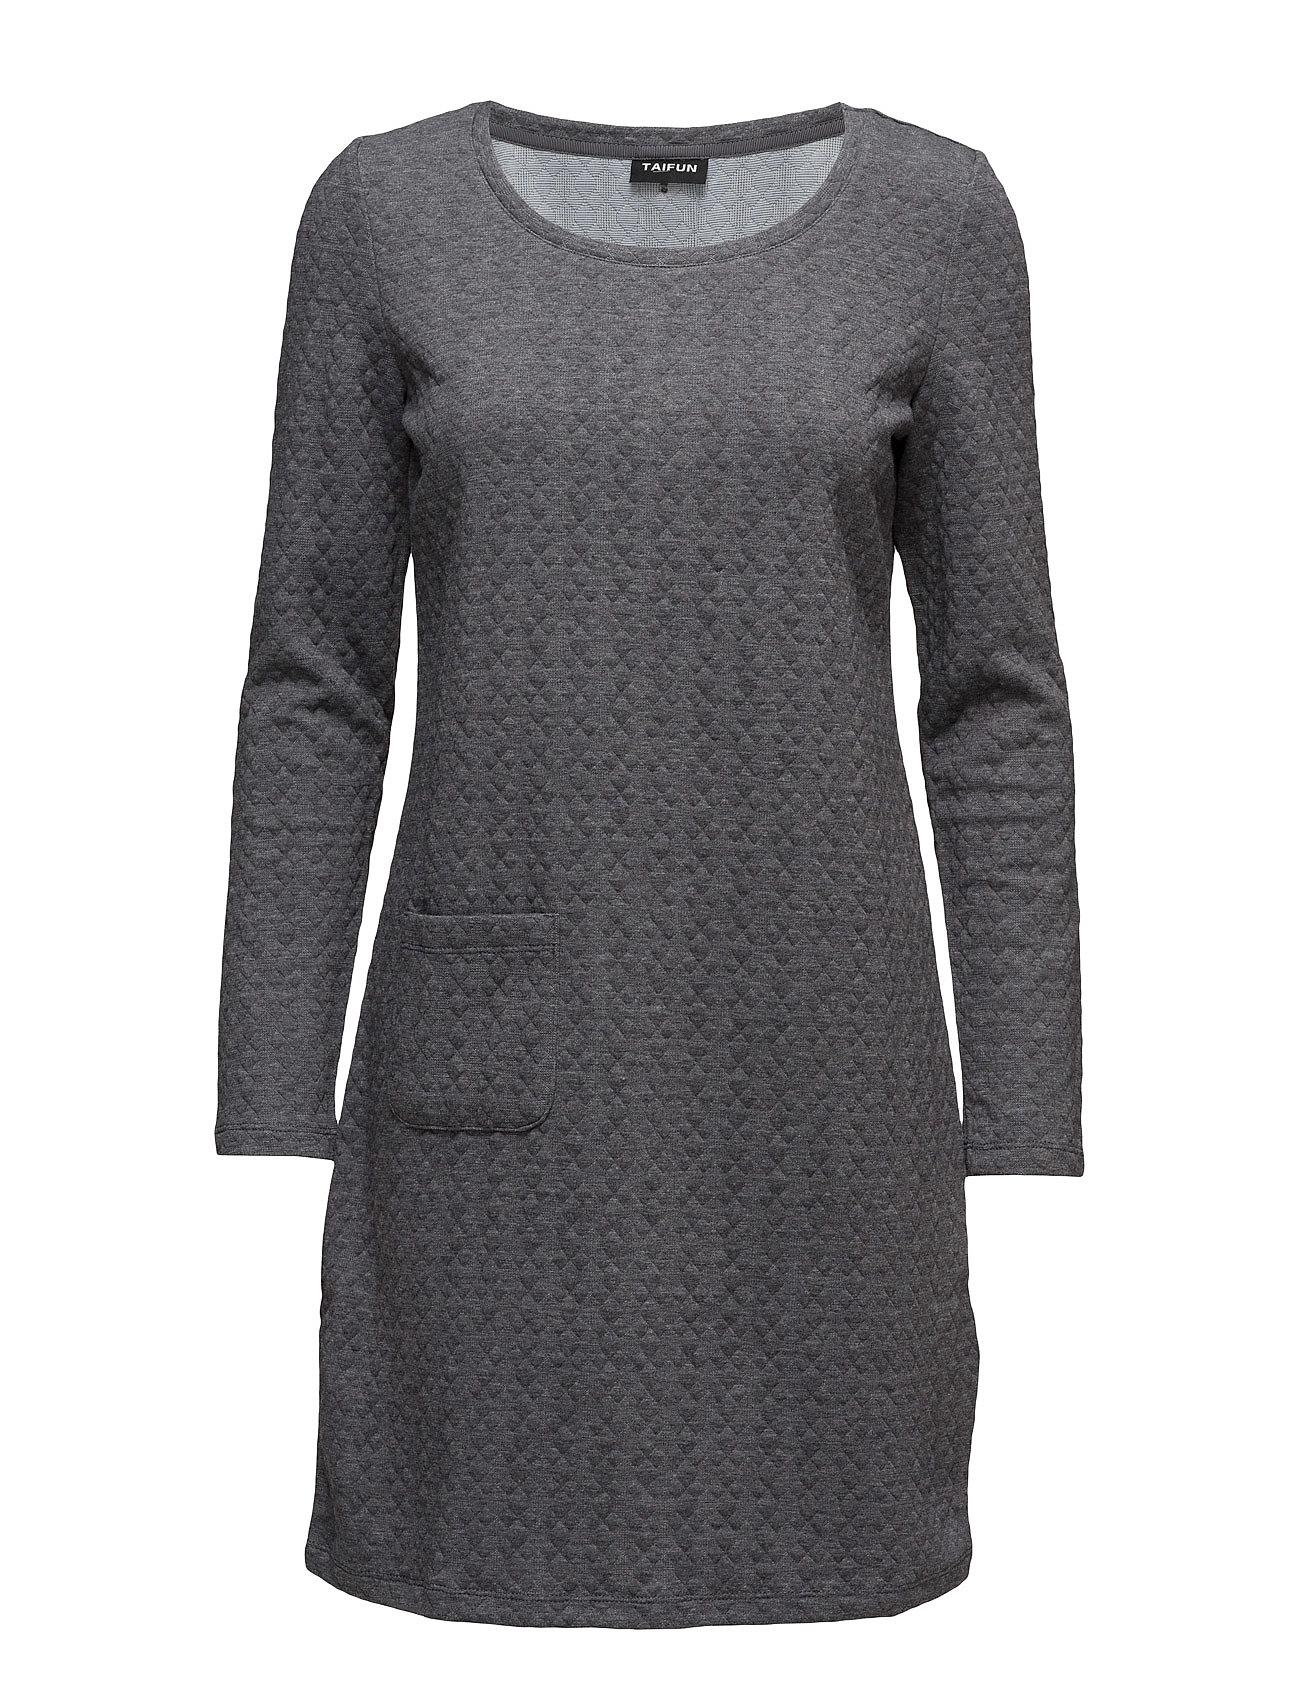 Dress knitted fabric fra taifun på boozt.com dk